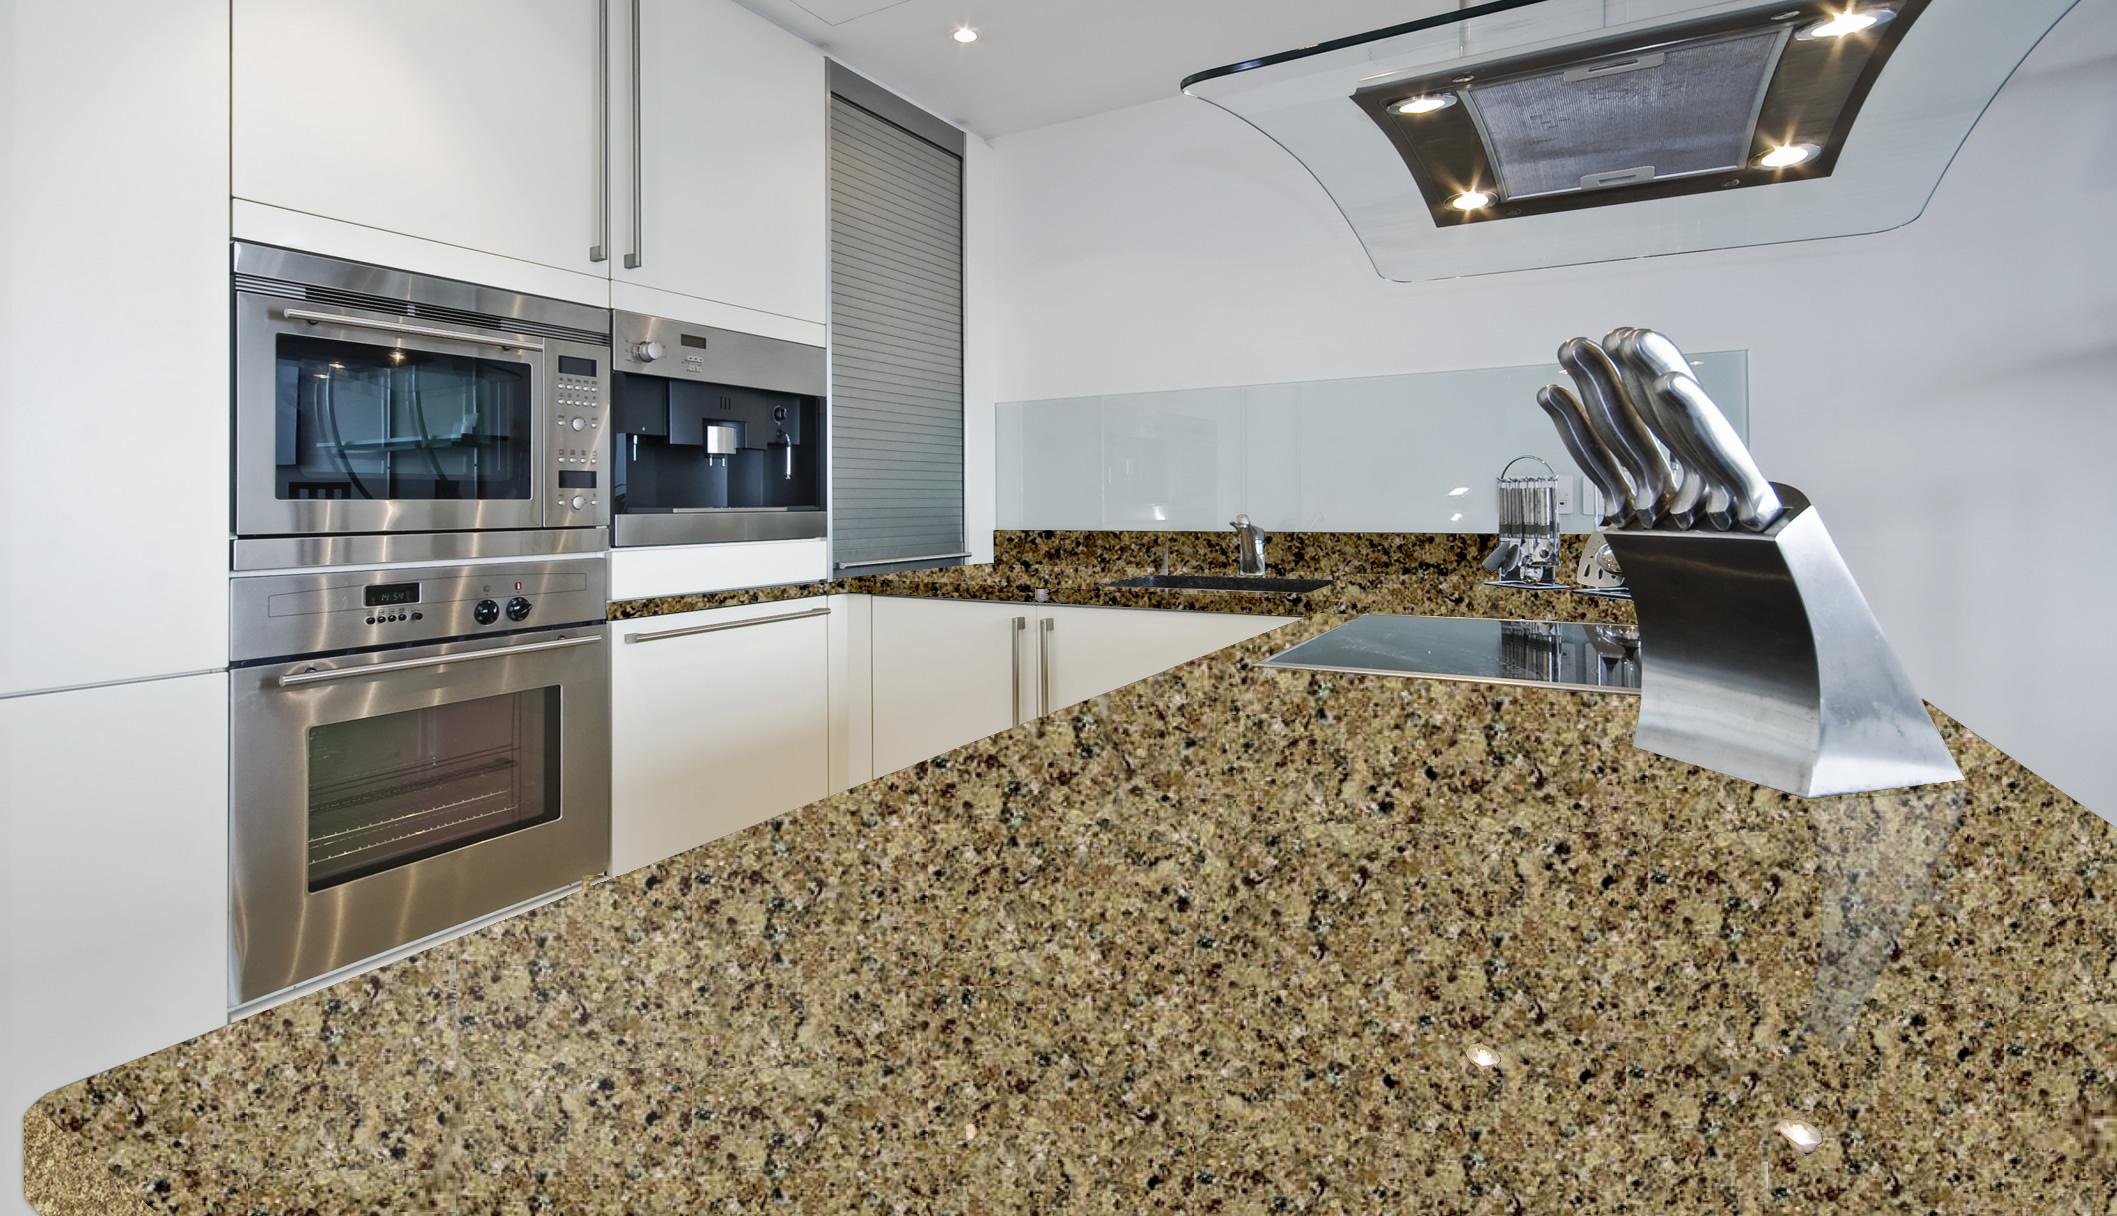 Ace Perma-Glaze Liquid Granite